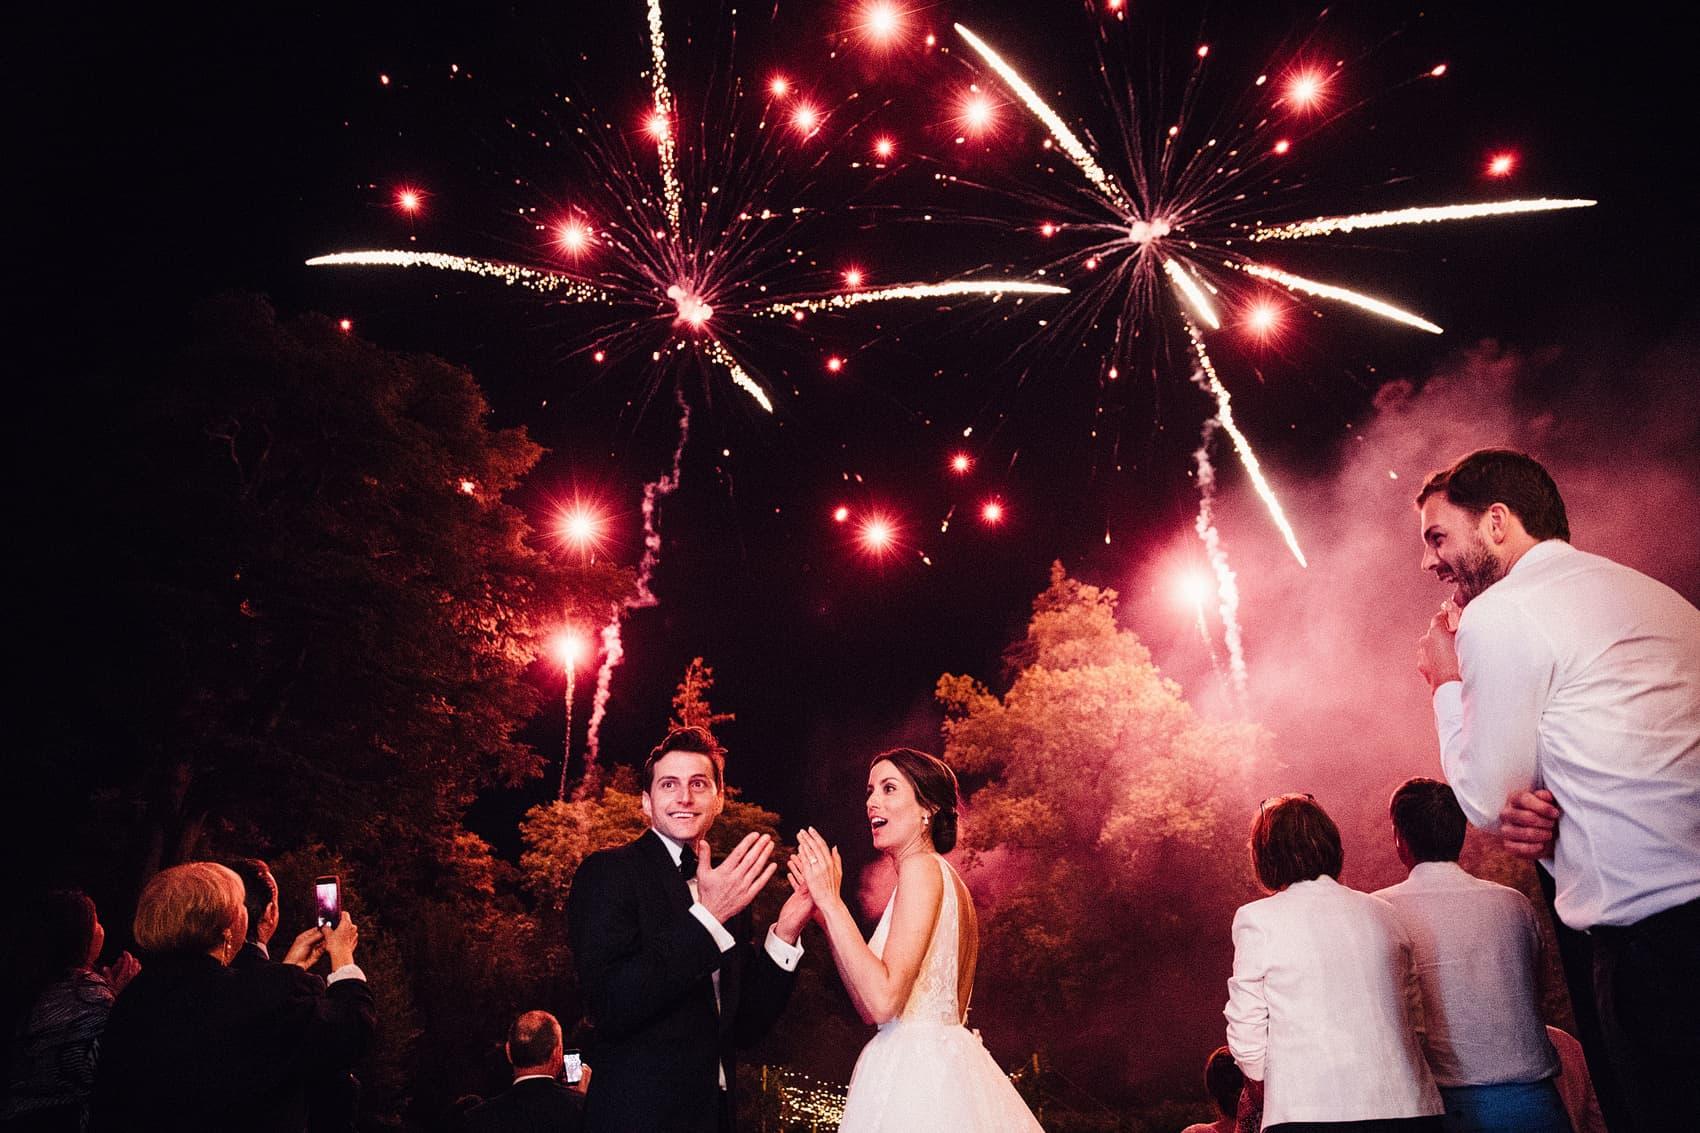 wedding fireworks photograph